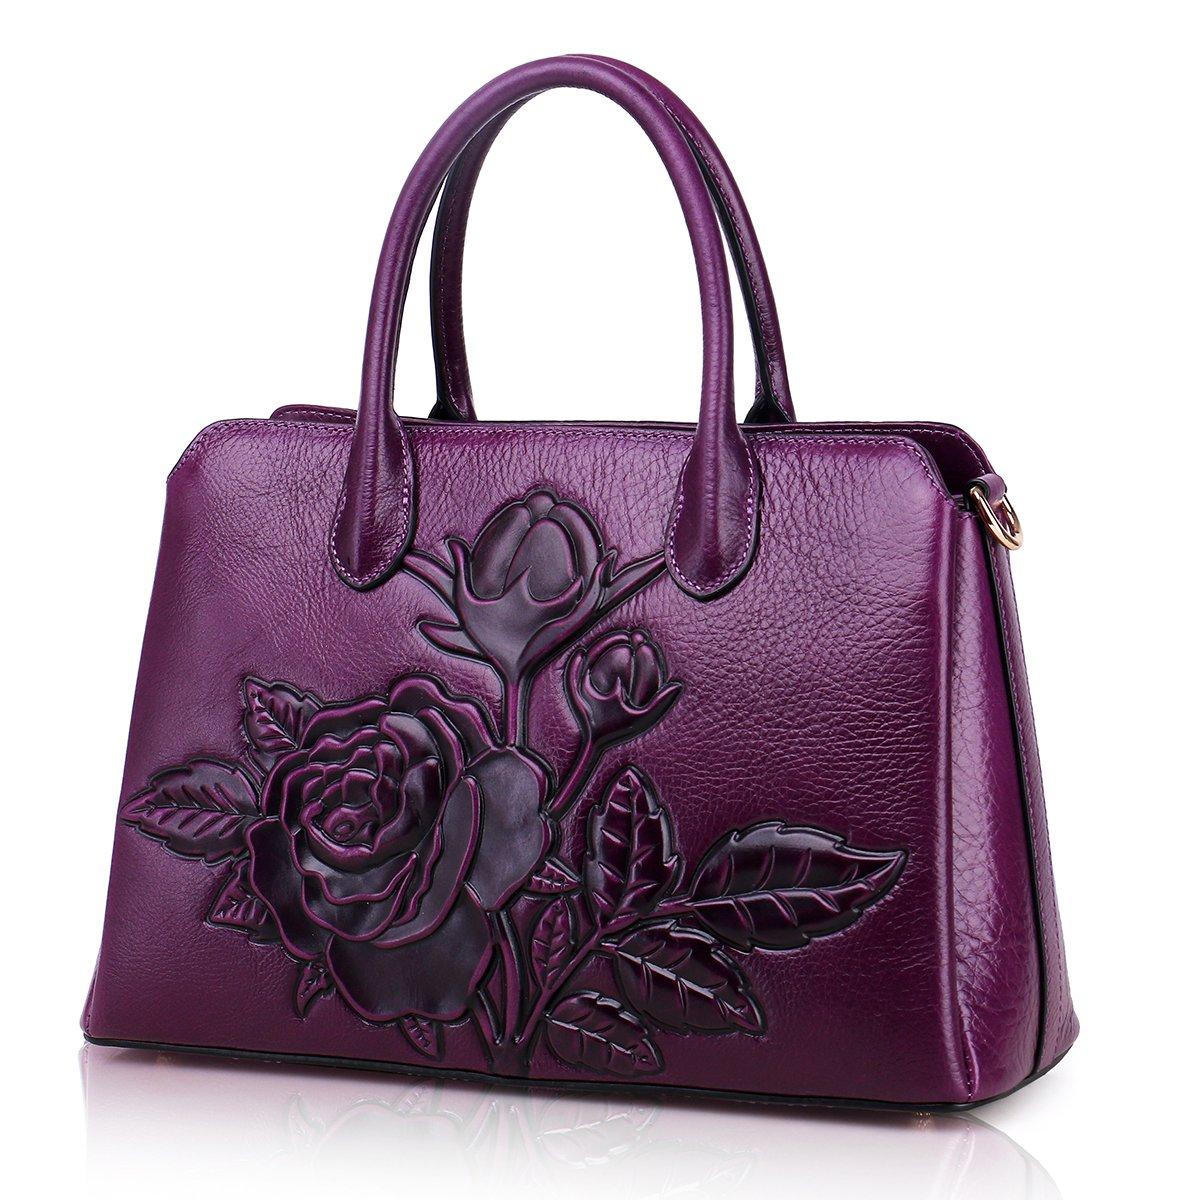 CDM product APHISON Designer Unique Embossed Floral Cowhide Leather Tote Style Ladies Top Handle Bags Handbags big image